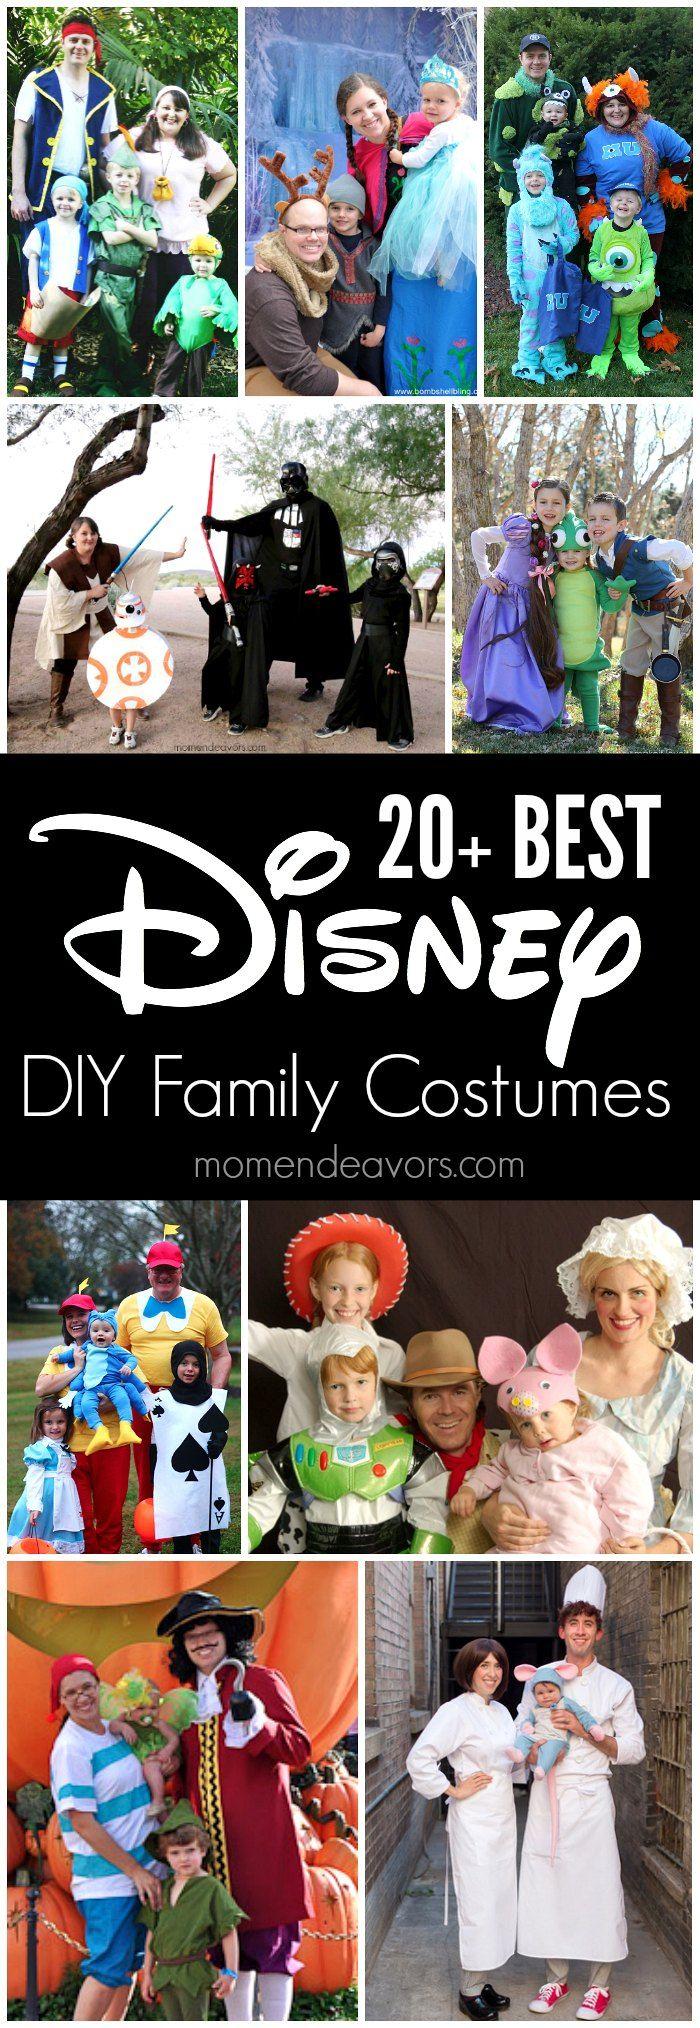 Cute Family Disney Halloween Costumes.20 Best Diy Disney Family Themed Halloween Costumes Popular On